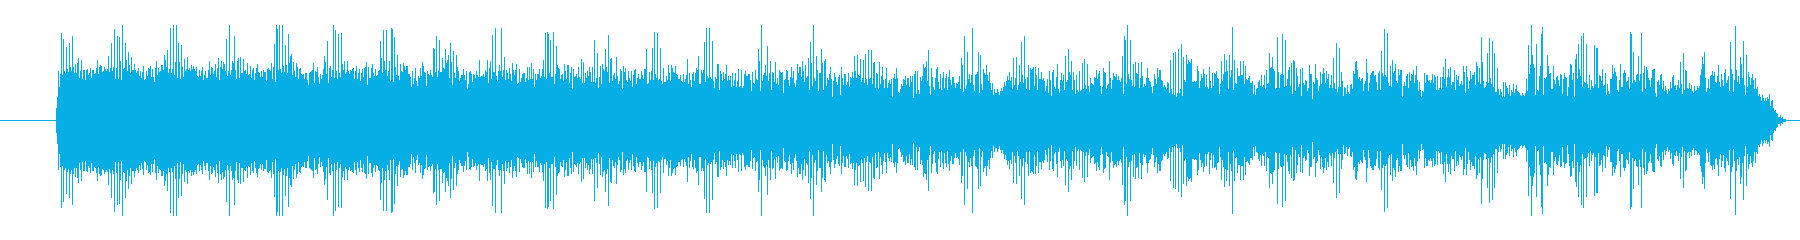 FX 着陸Ufo 02の再生済みの波形